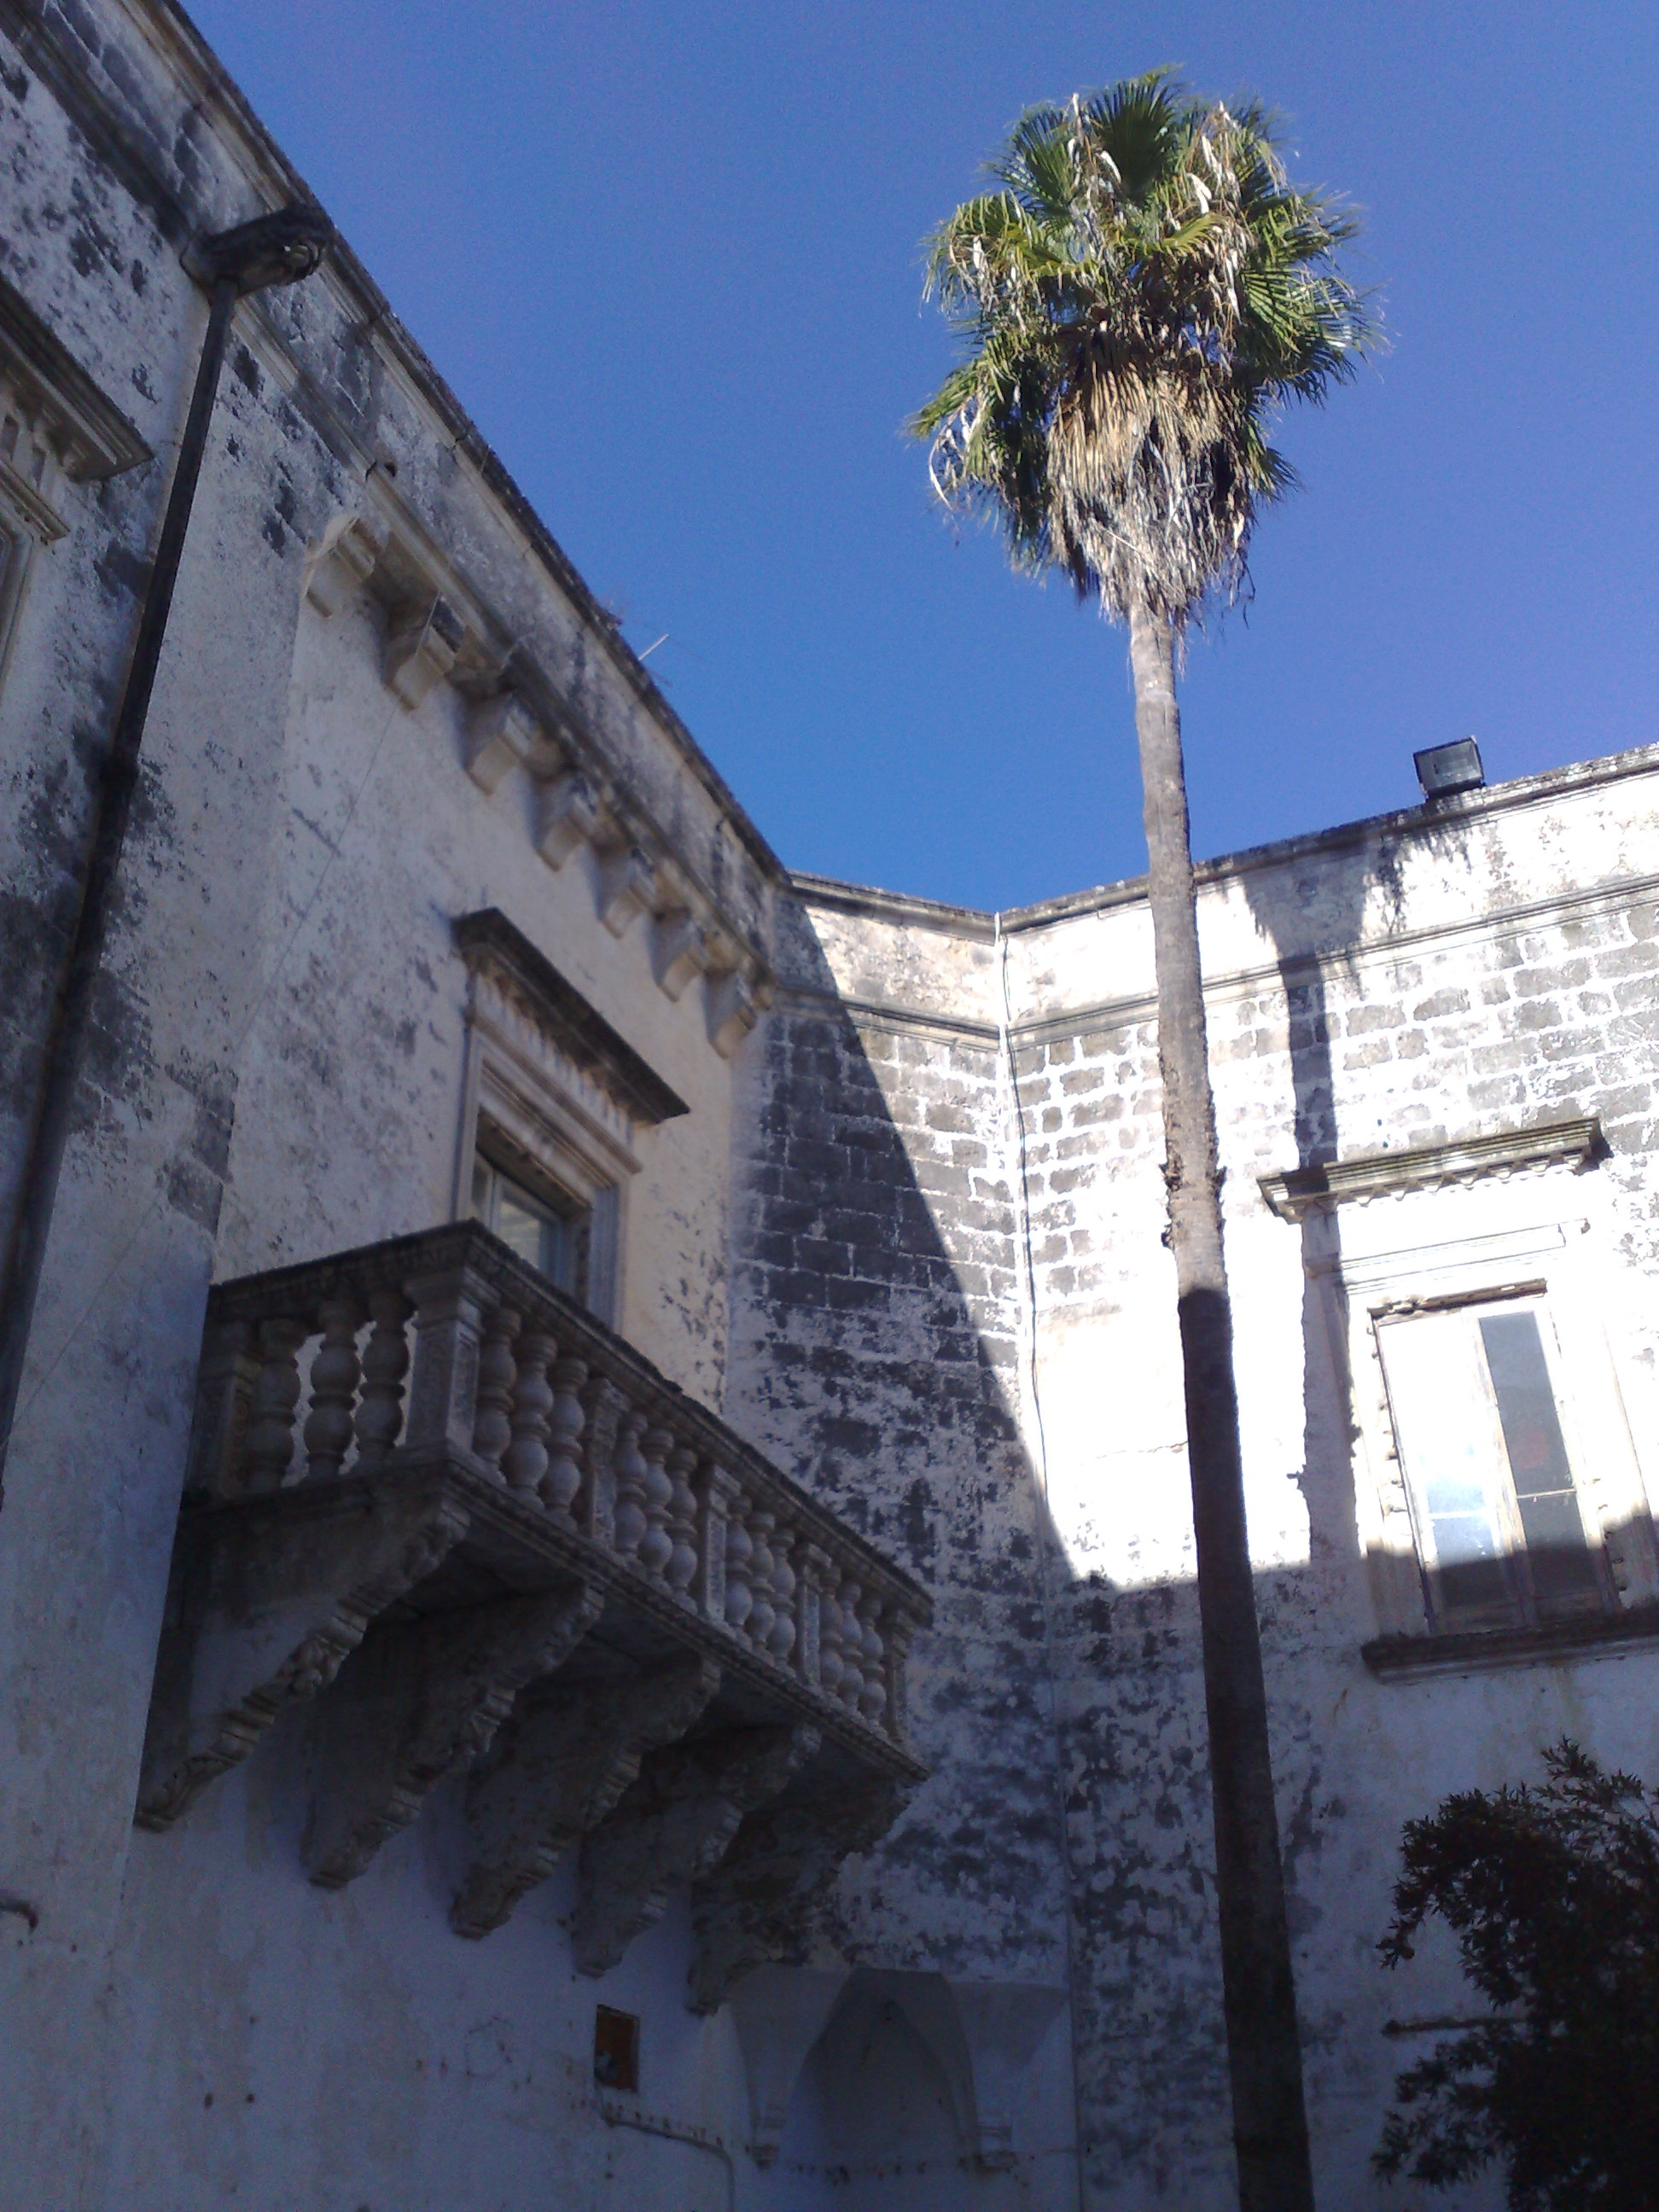 Cutrofiano: Palazzo Filomarini